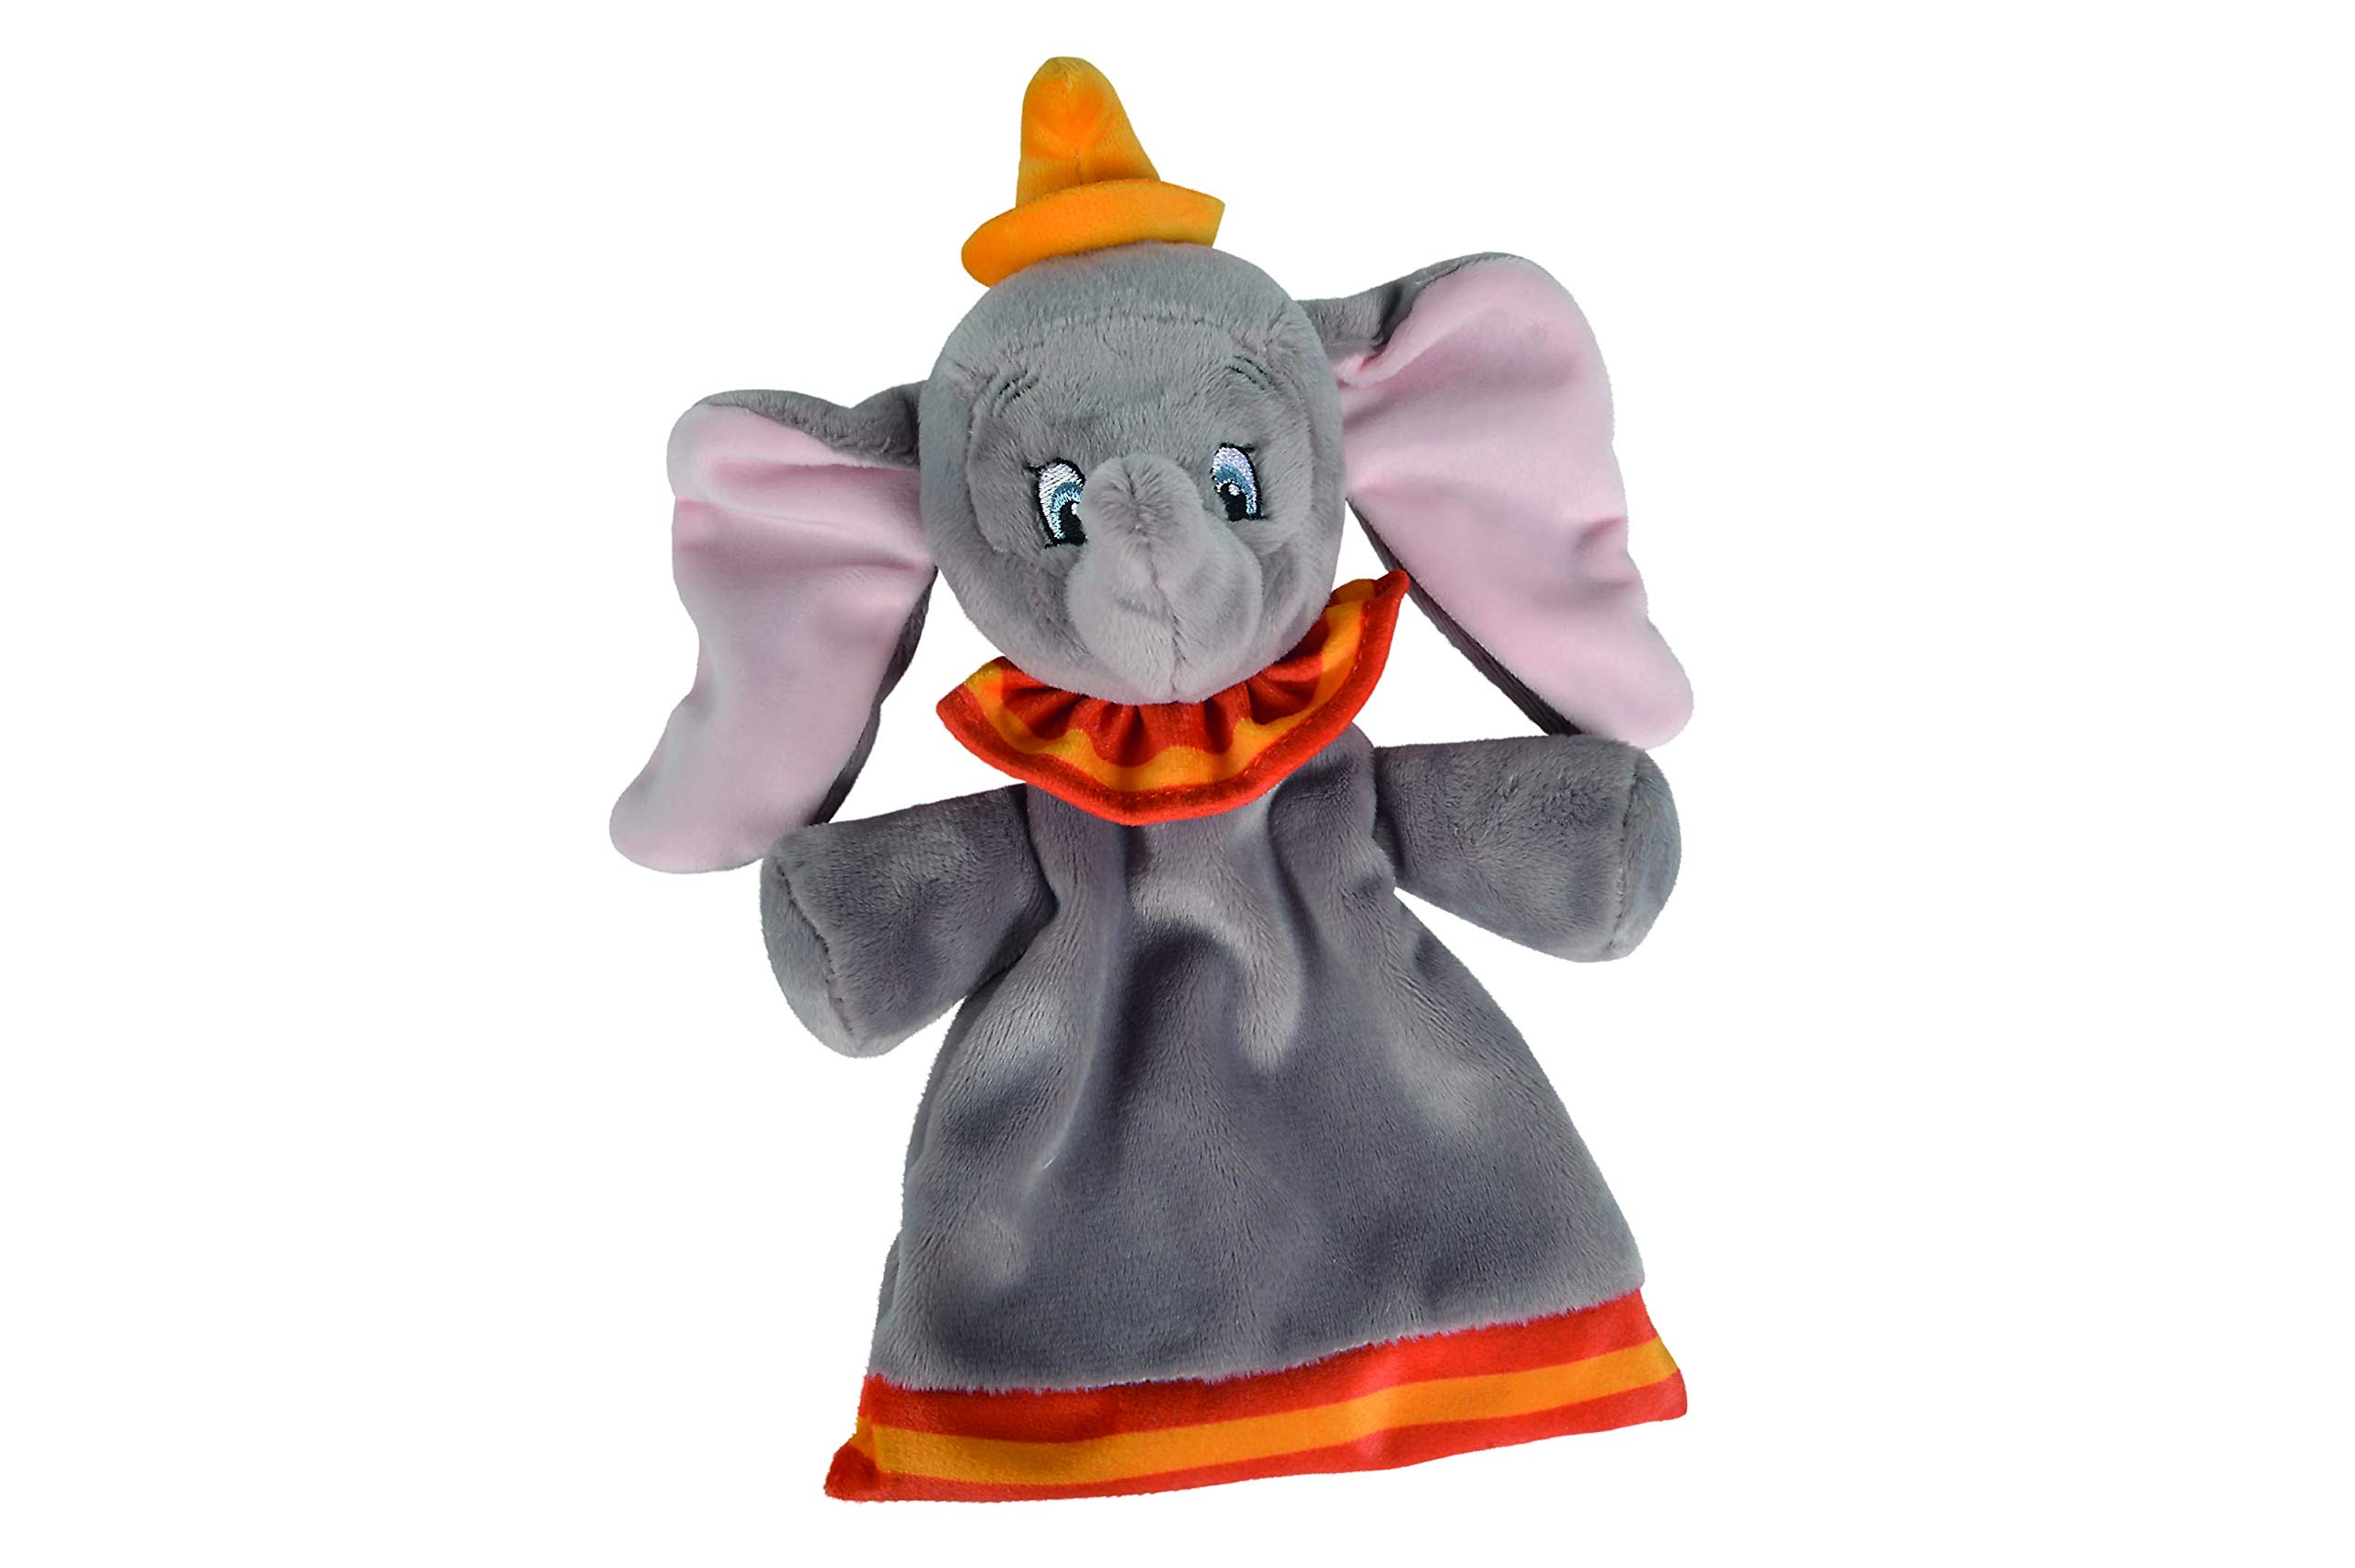 Simba 6315876832 Disney Dumbo - Manta de Seguridad